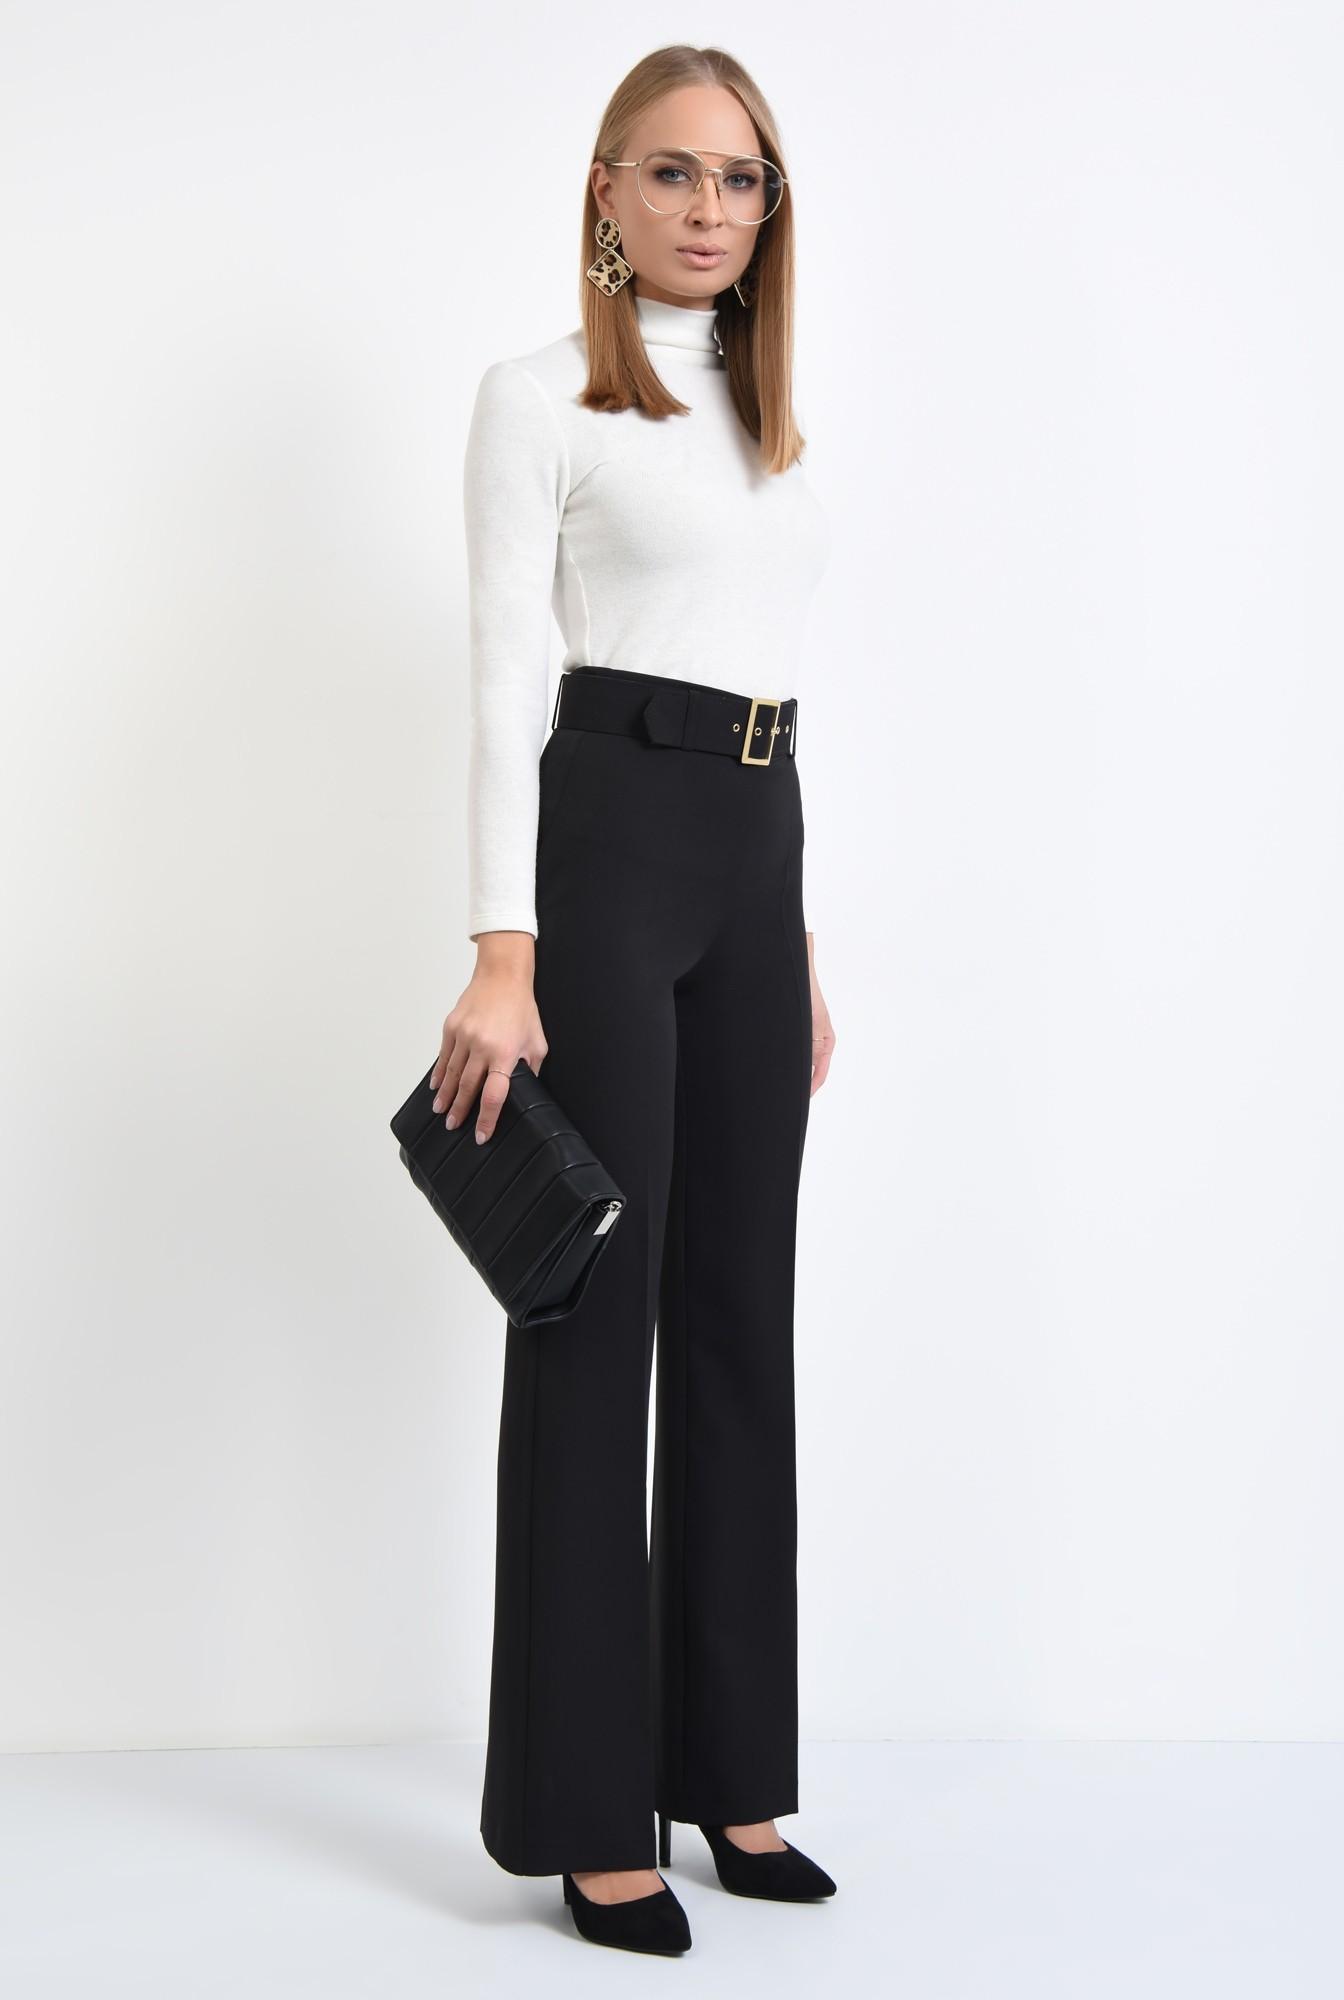 3 - pantaloni de ocazie, centura din material textil, pantaloni online